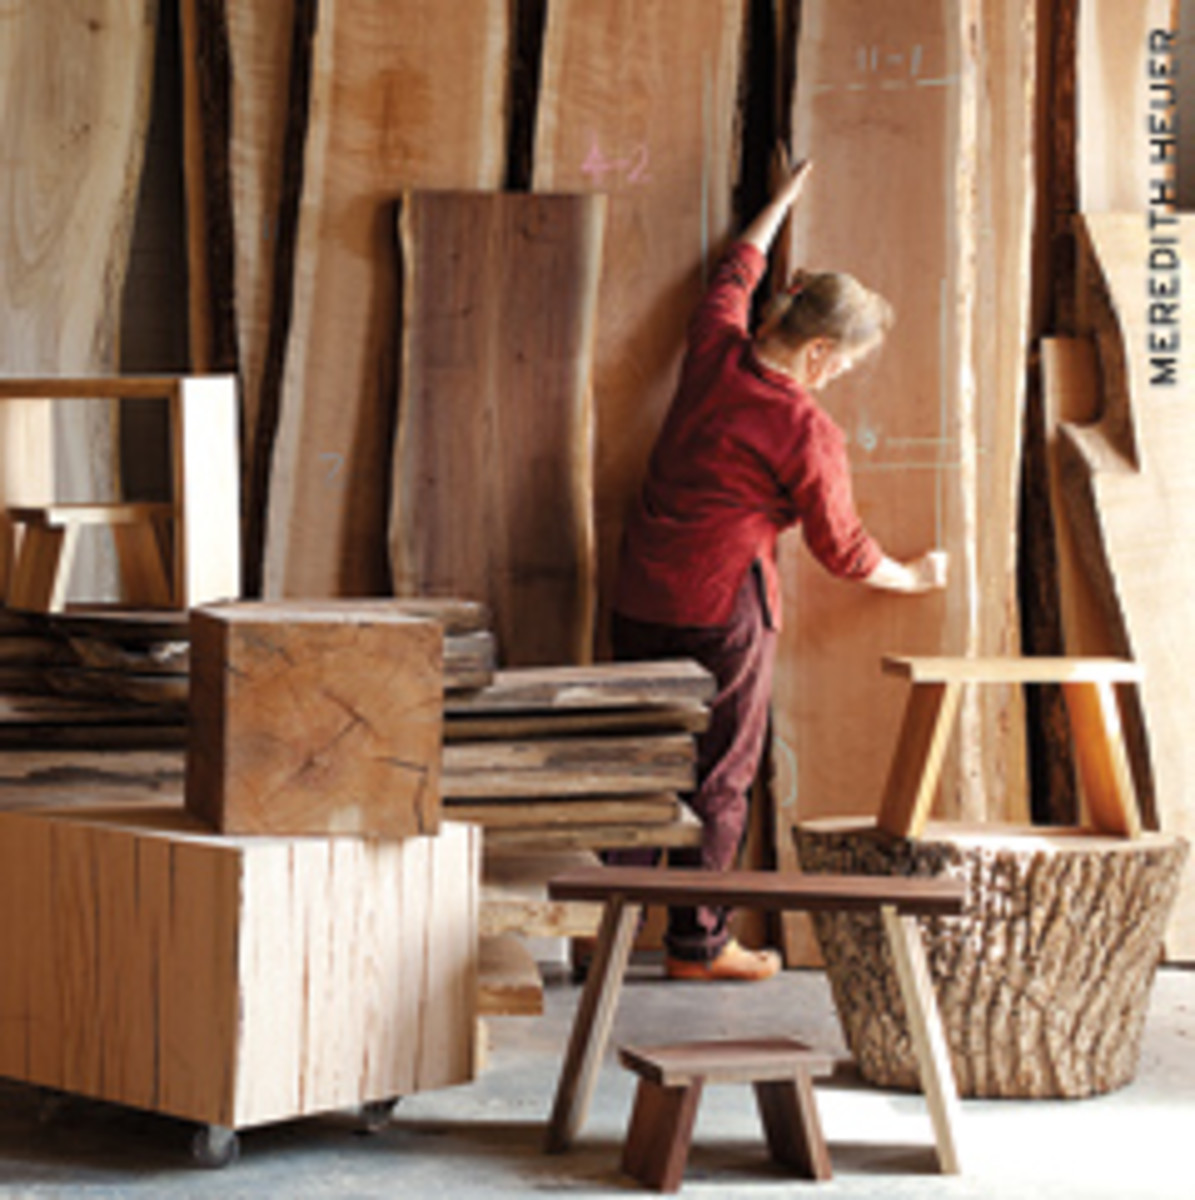 Jessica Wickham works in her shop in Beacon, N.Y.